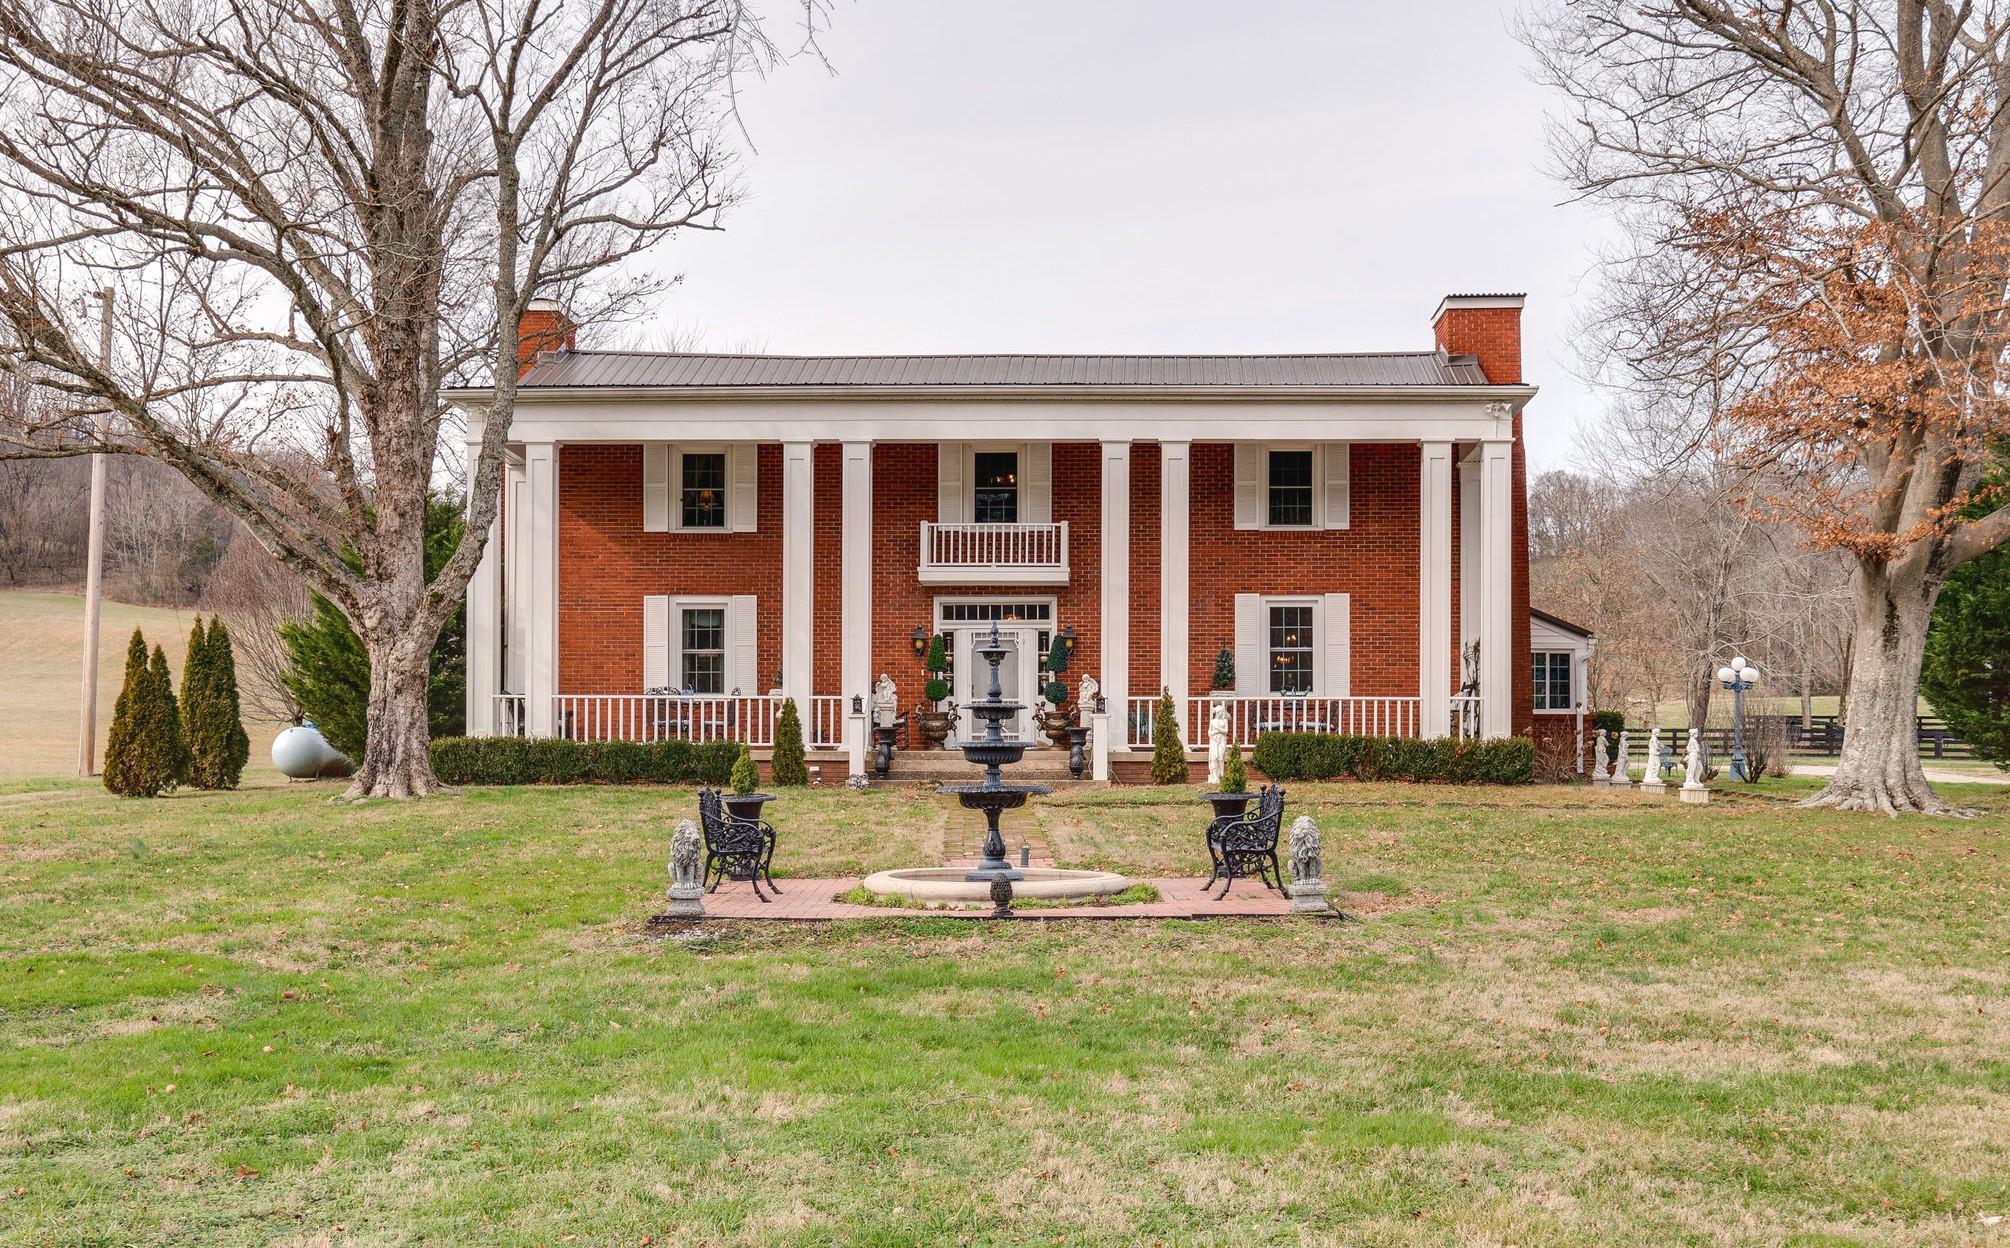 4596 Pulaski HWY, Culleoka, TN 38451 - Culleoka, TN real estate listing